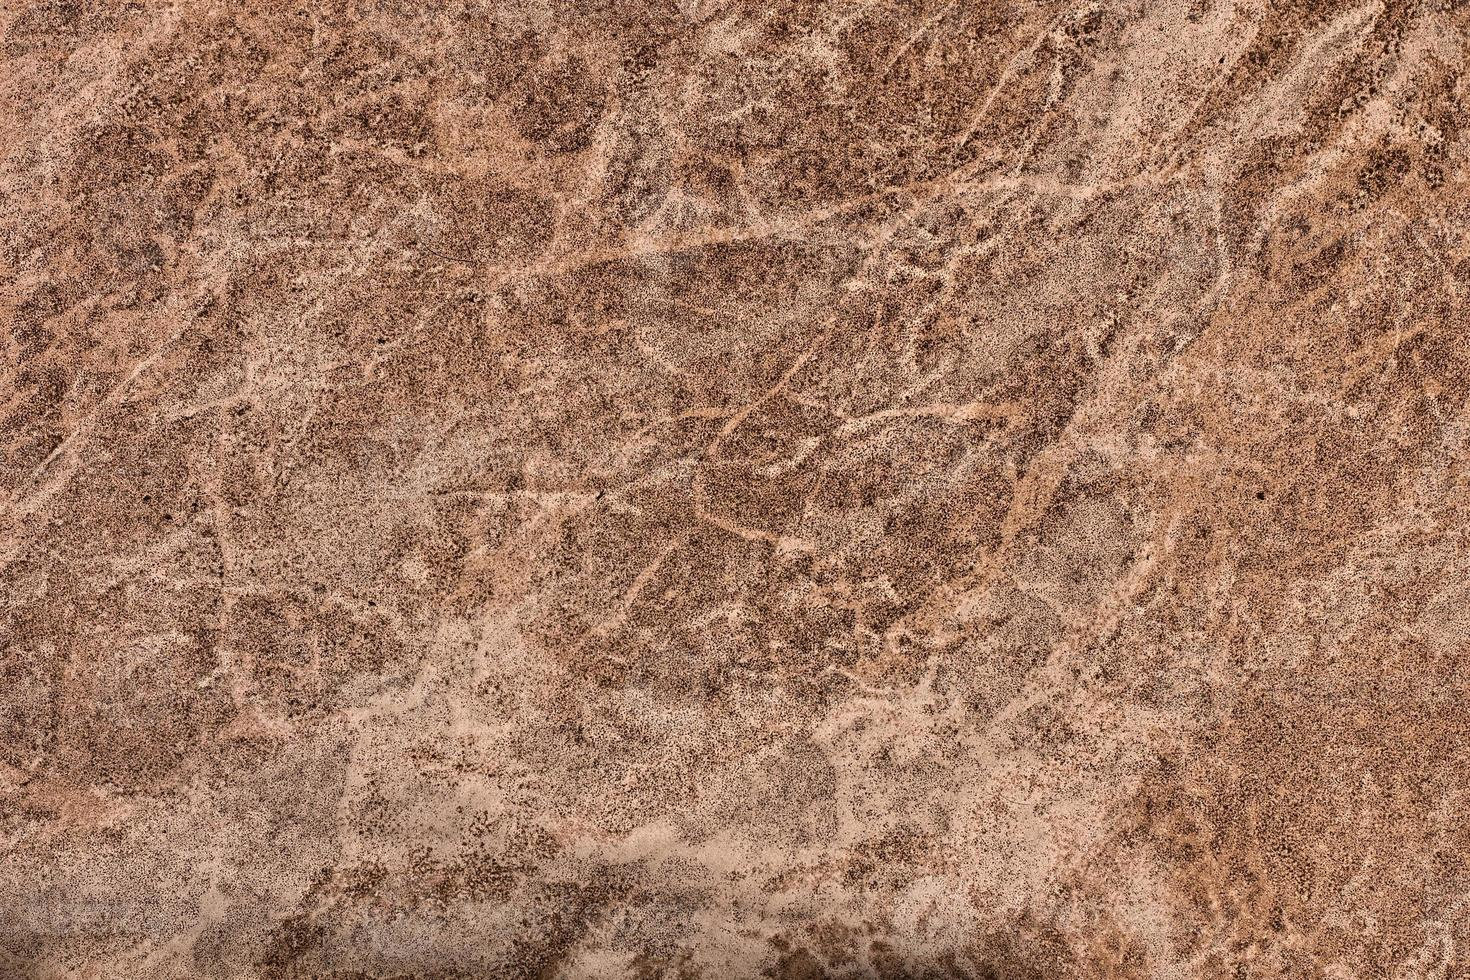 textura de mármol foto